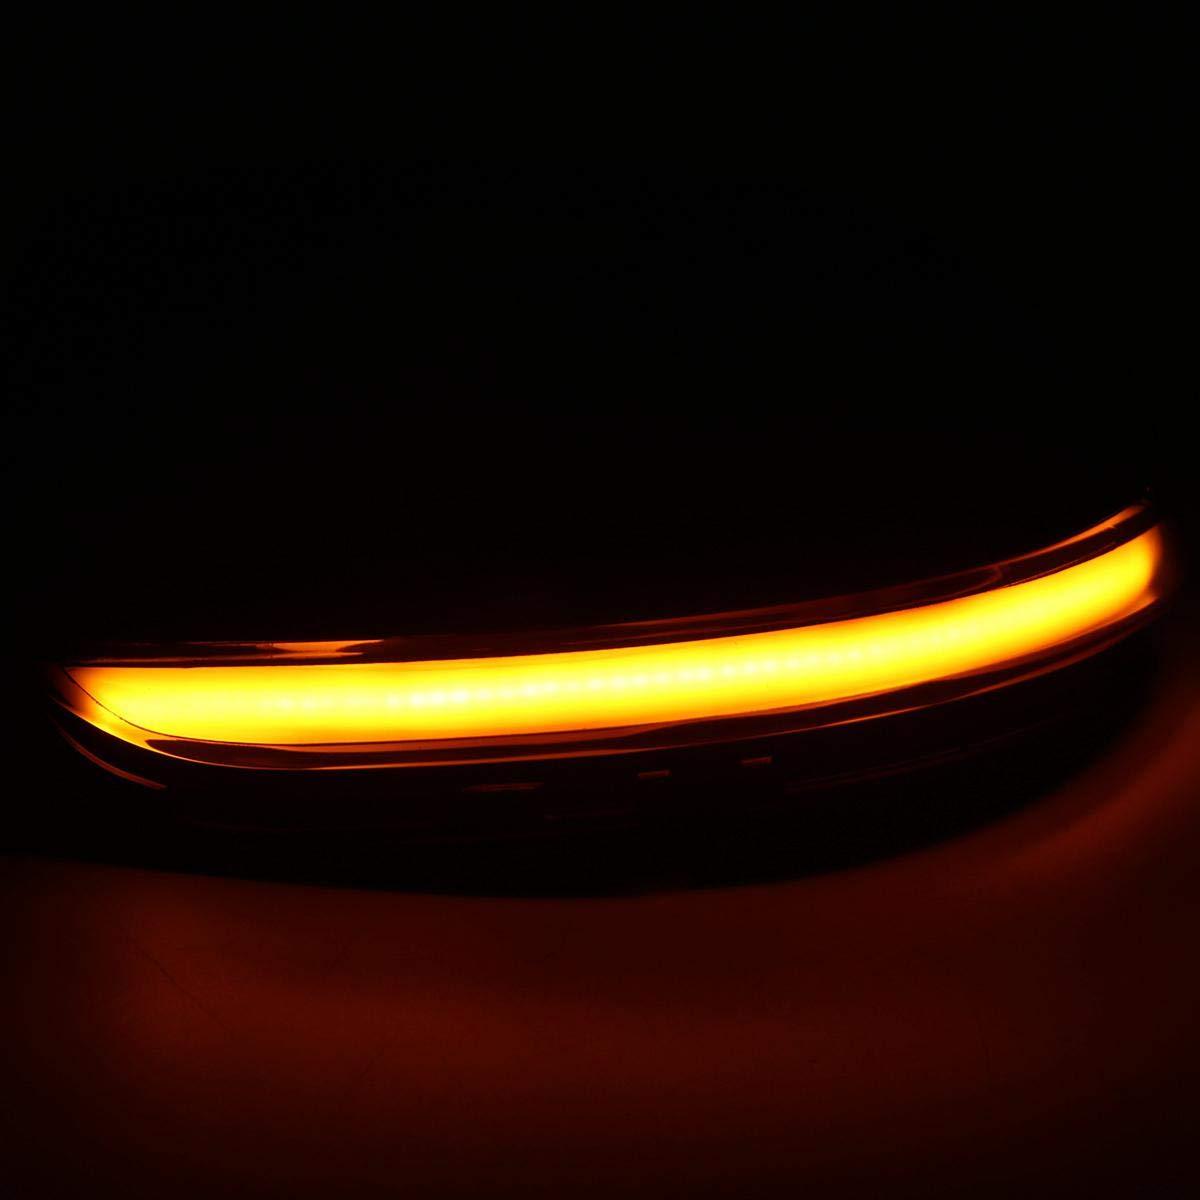 Parpadeo Secuencial Indicador De Espejo De Ala Accesorios De Carro Per V-W UMIWE Indicador Espejo Din/áMico Luces De Se/ñAl De Giro LED Lentes L/áMpara Coche Asambleas Passat//EOS//Beetle//Scirocco//Jetta